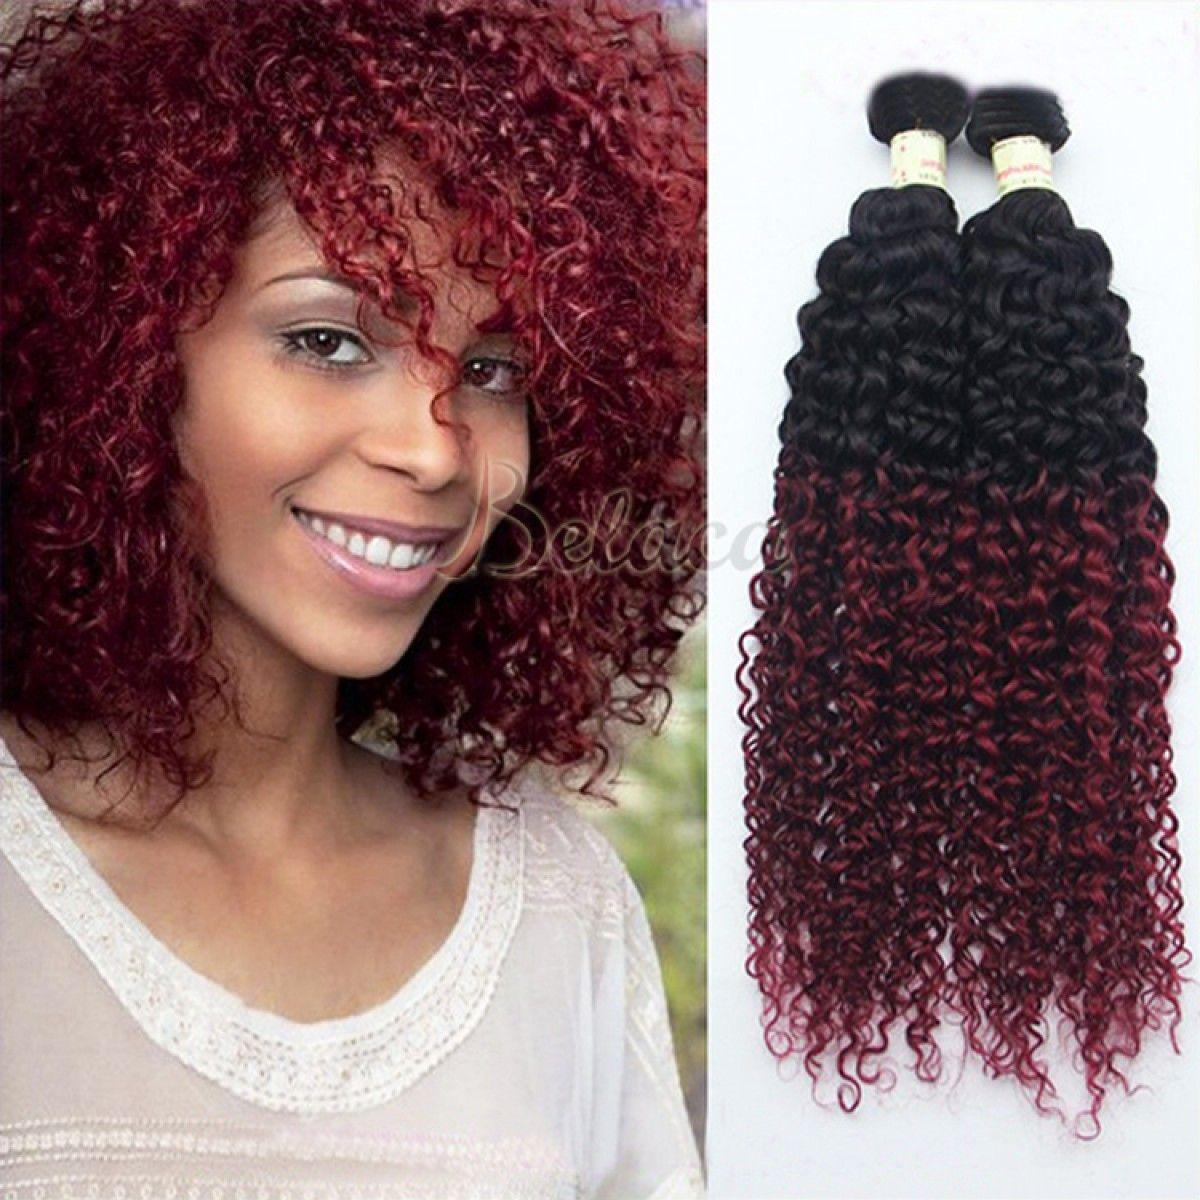 3 Bundles Burgundy Colored Weave Curly Brazilian Ombre Hair Bundles